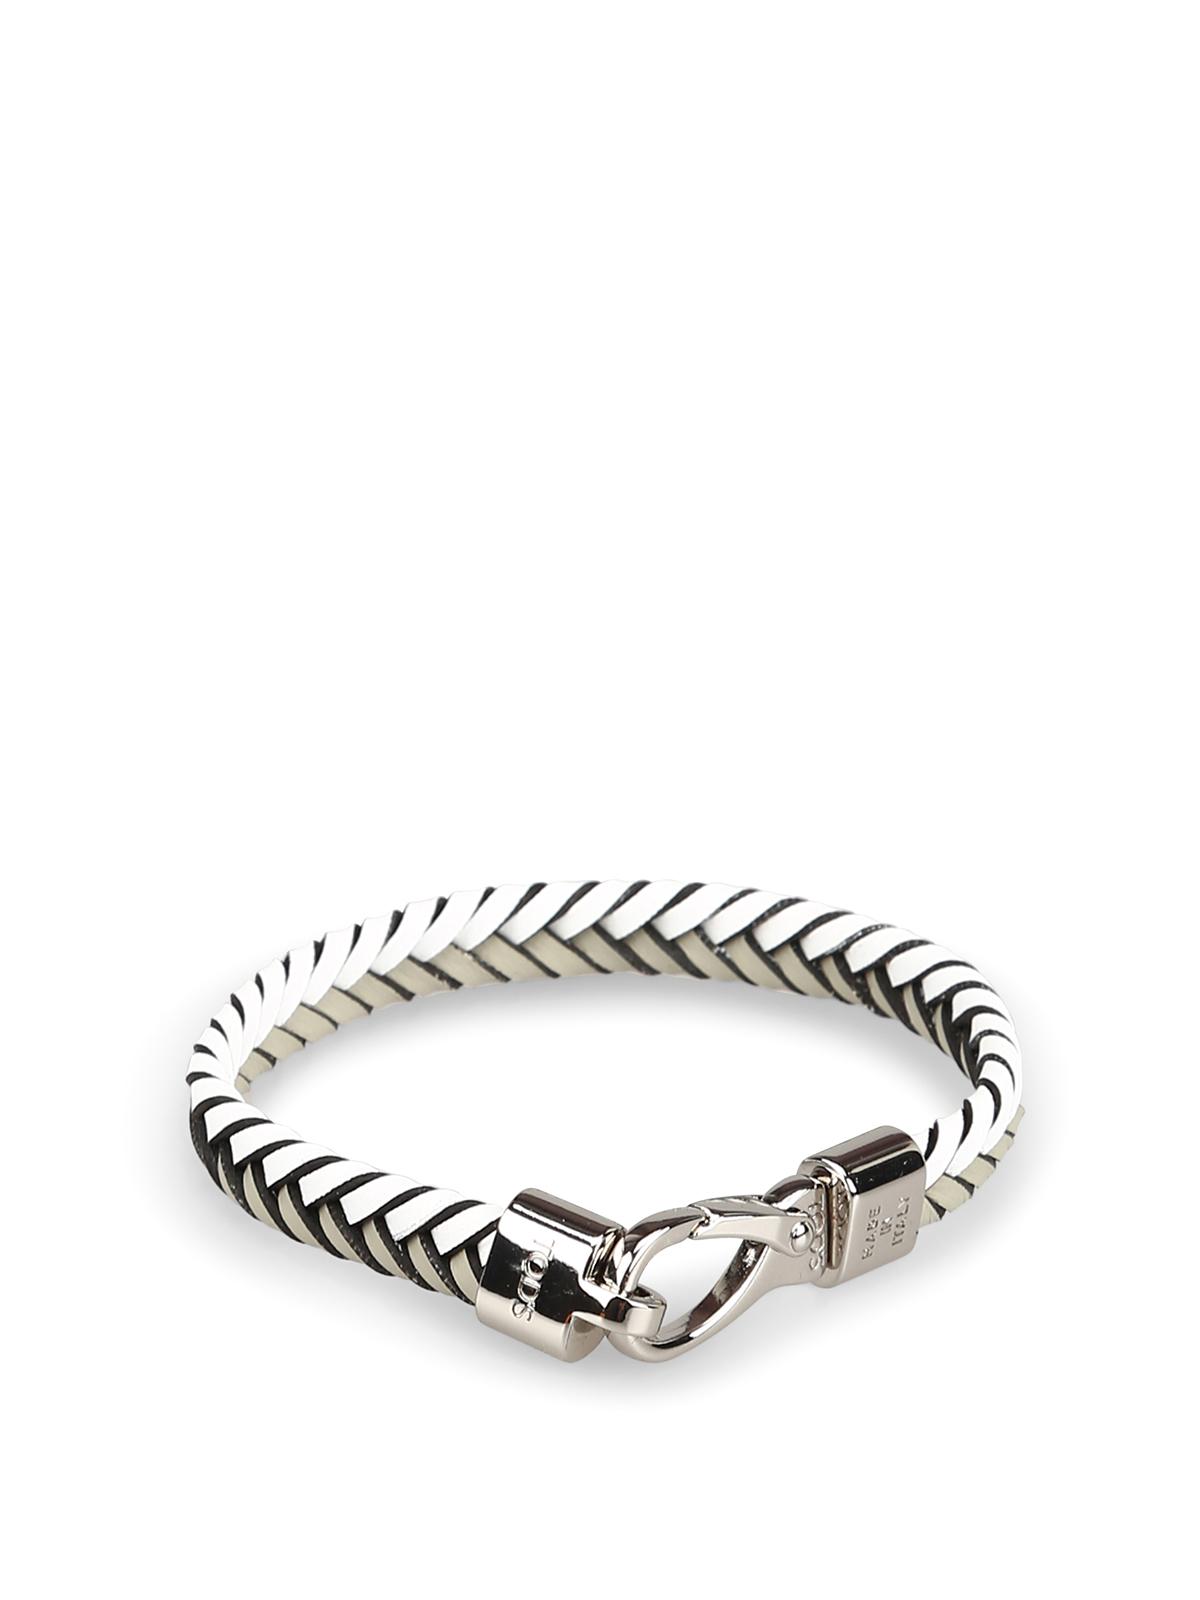 Grey Woven Leather Flat Bracelet